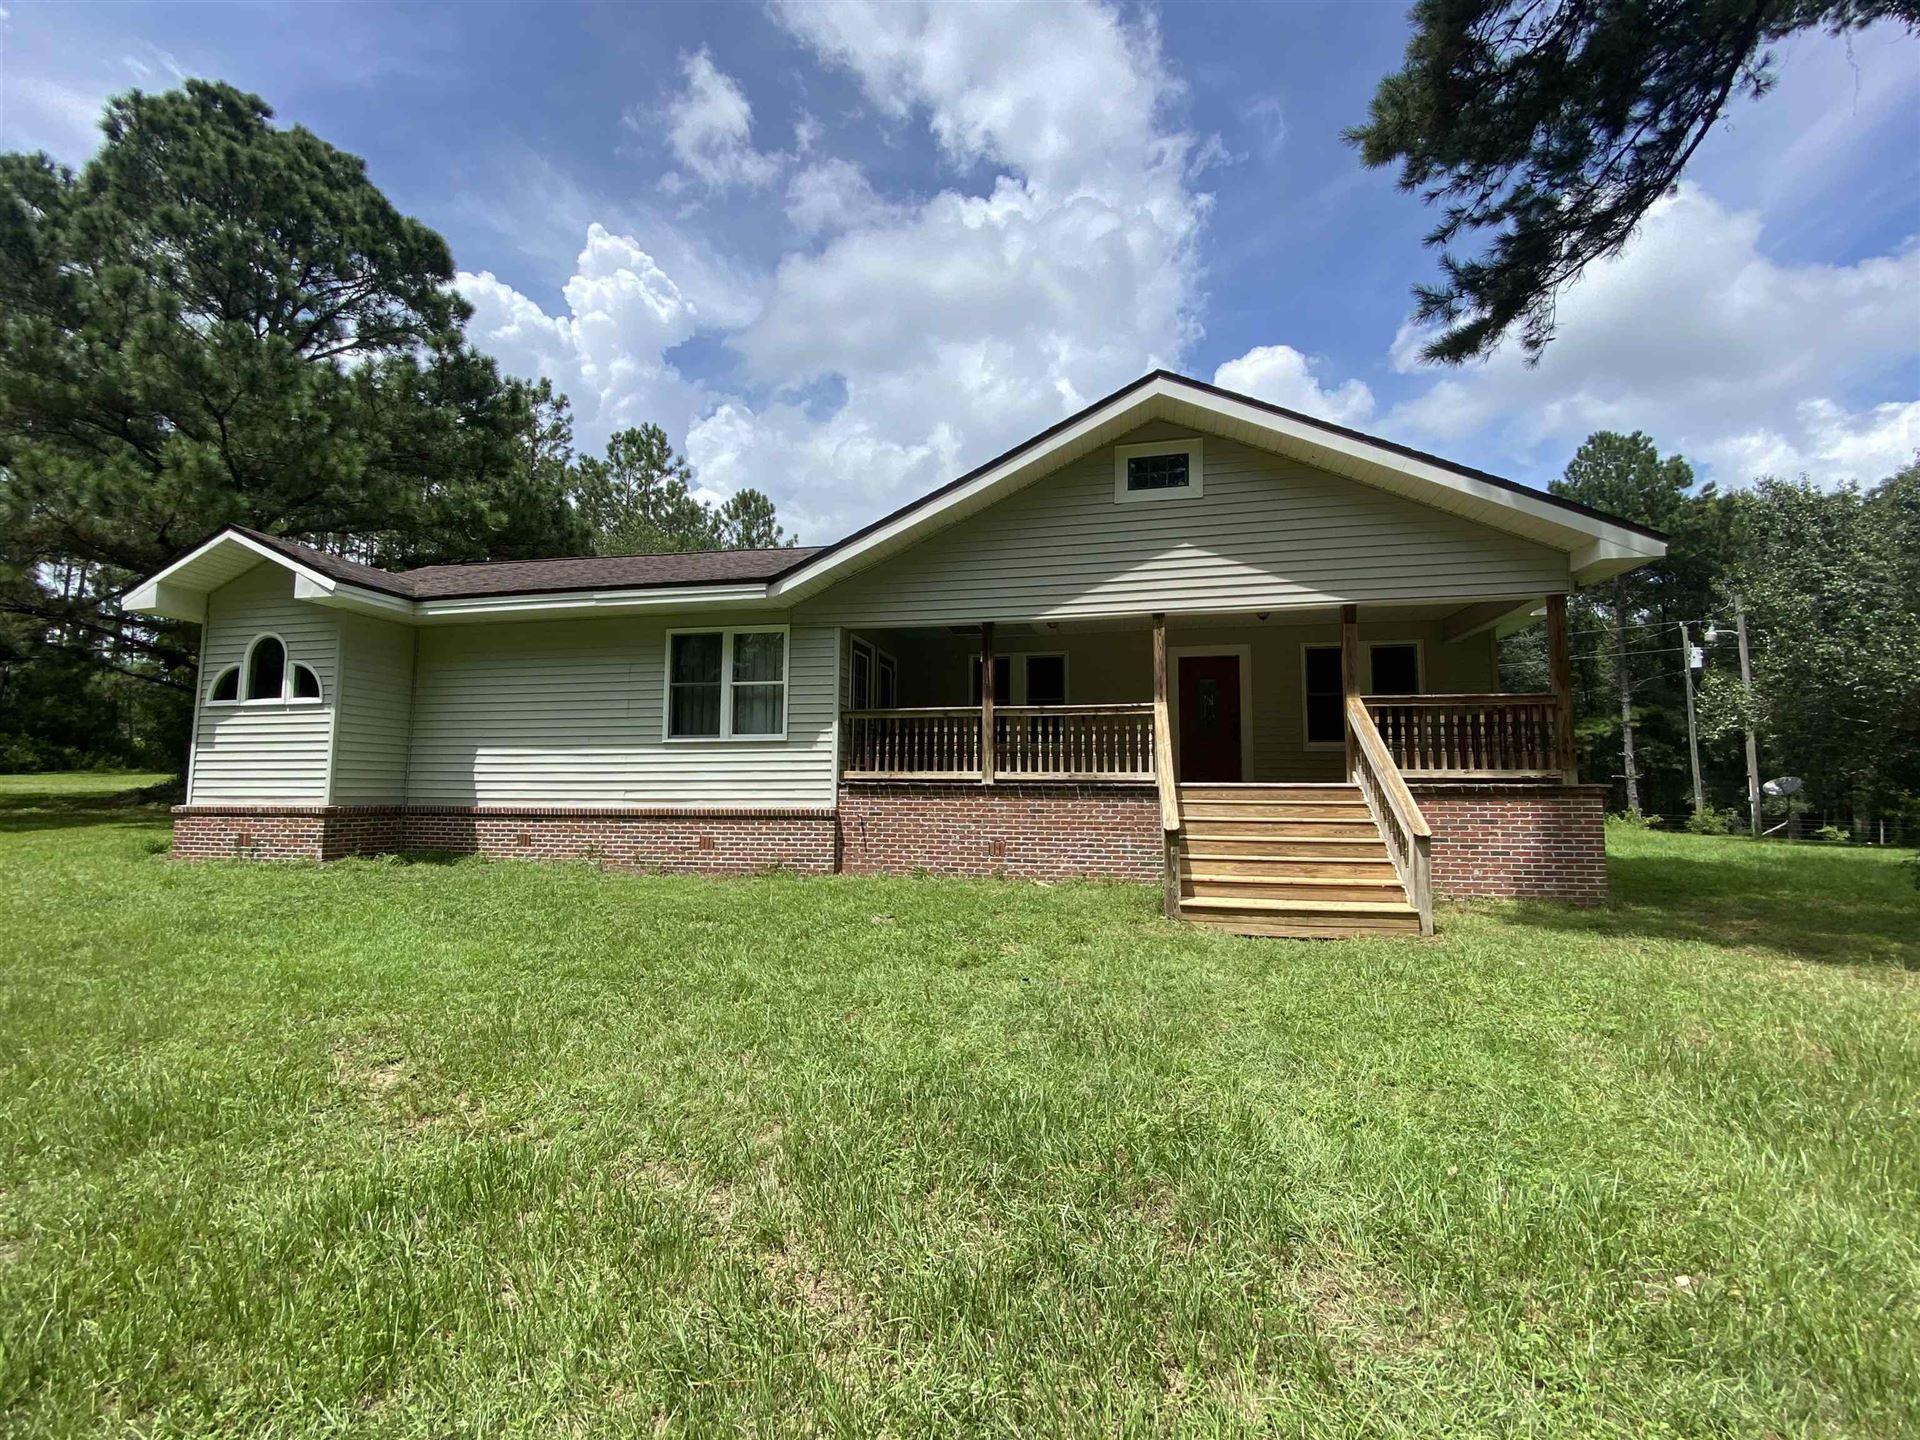 Photo of 139 NW Whelks Lane, GREENVILLE, FL 32331 (MLS # 336847)